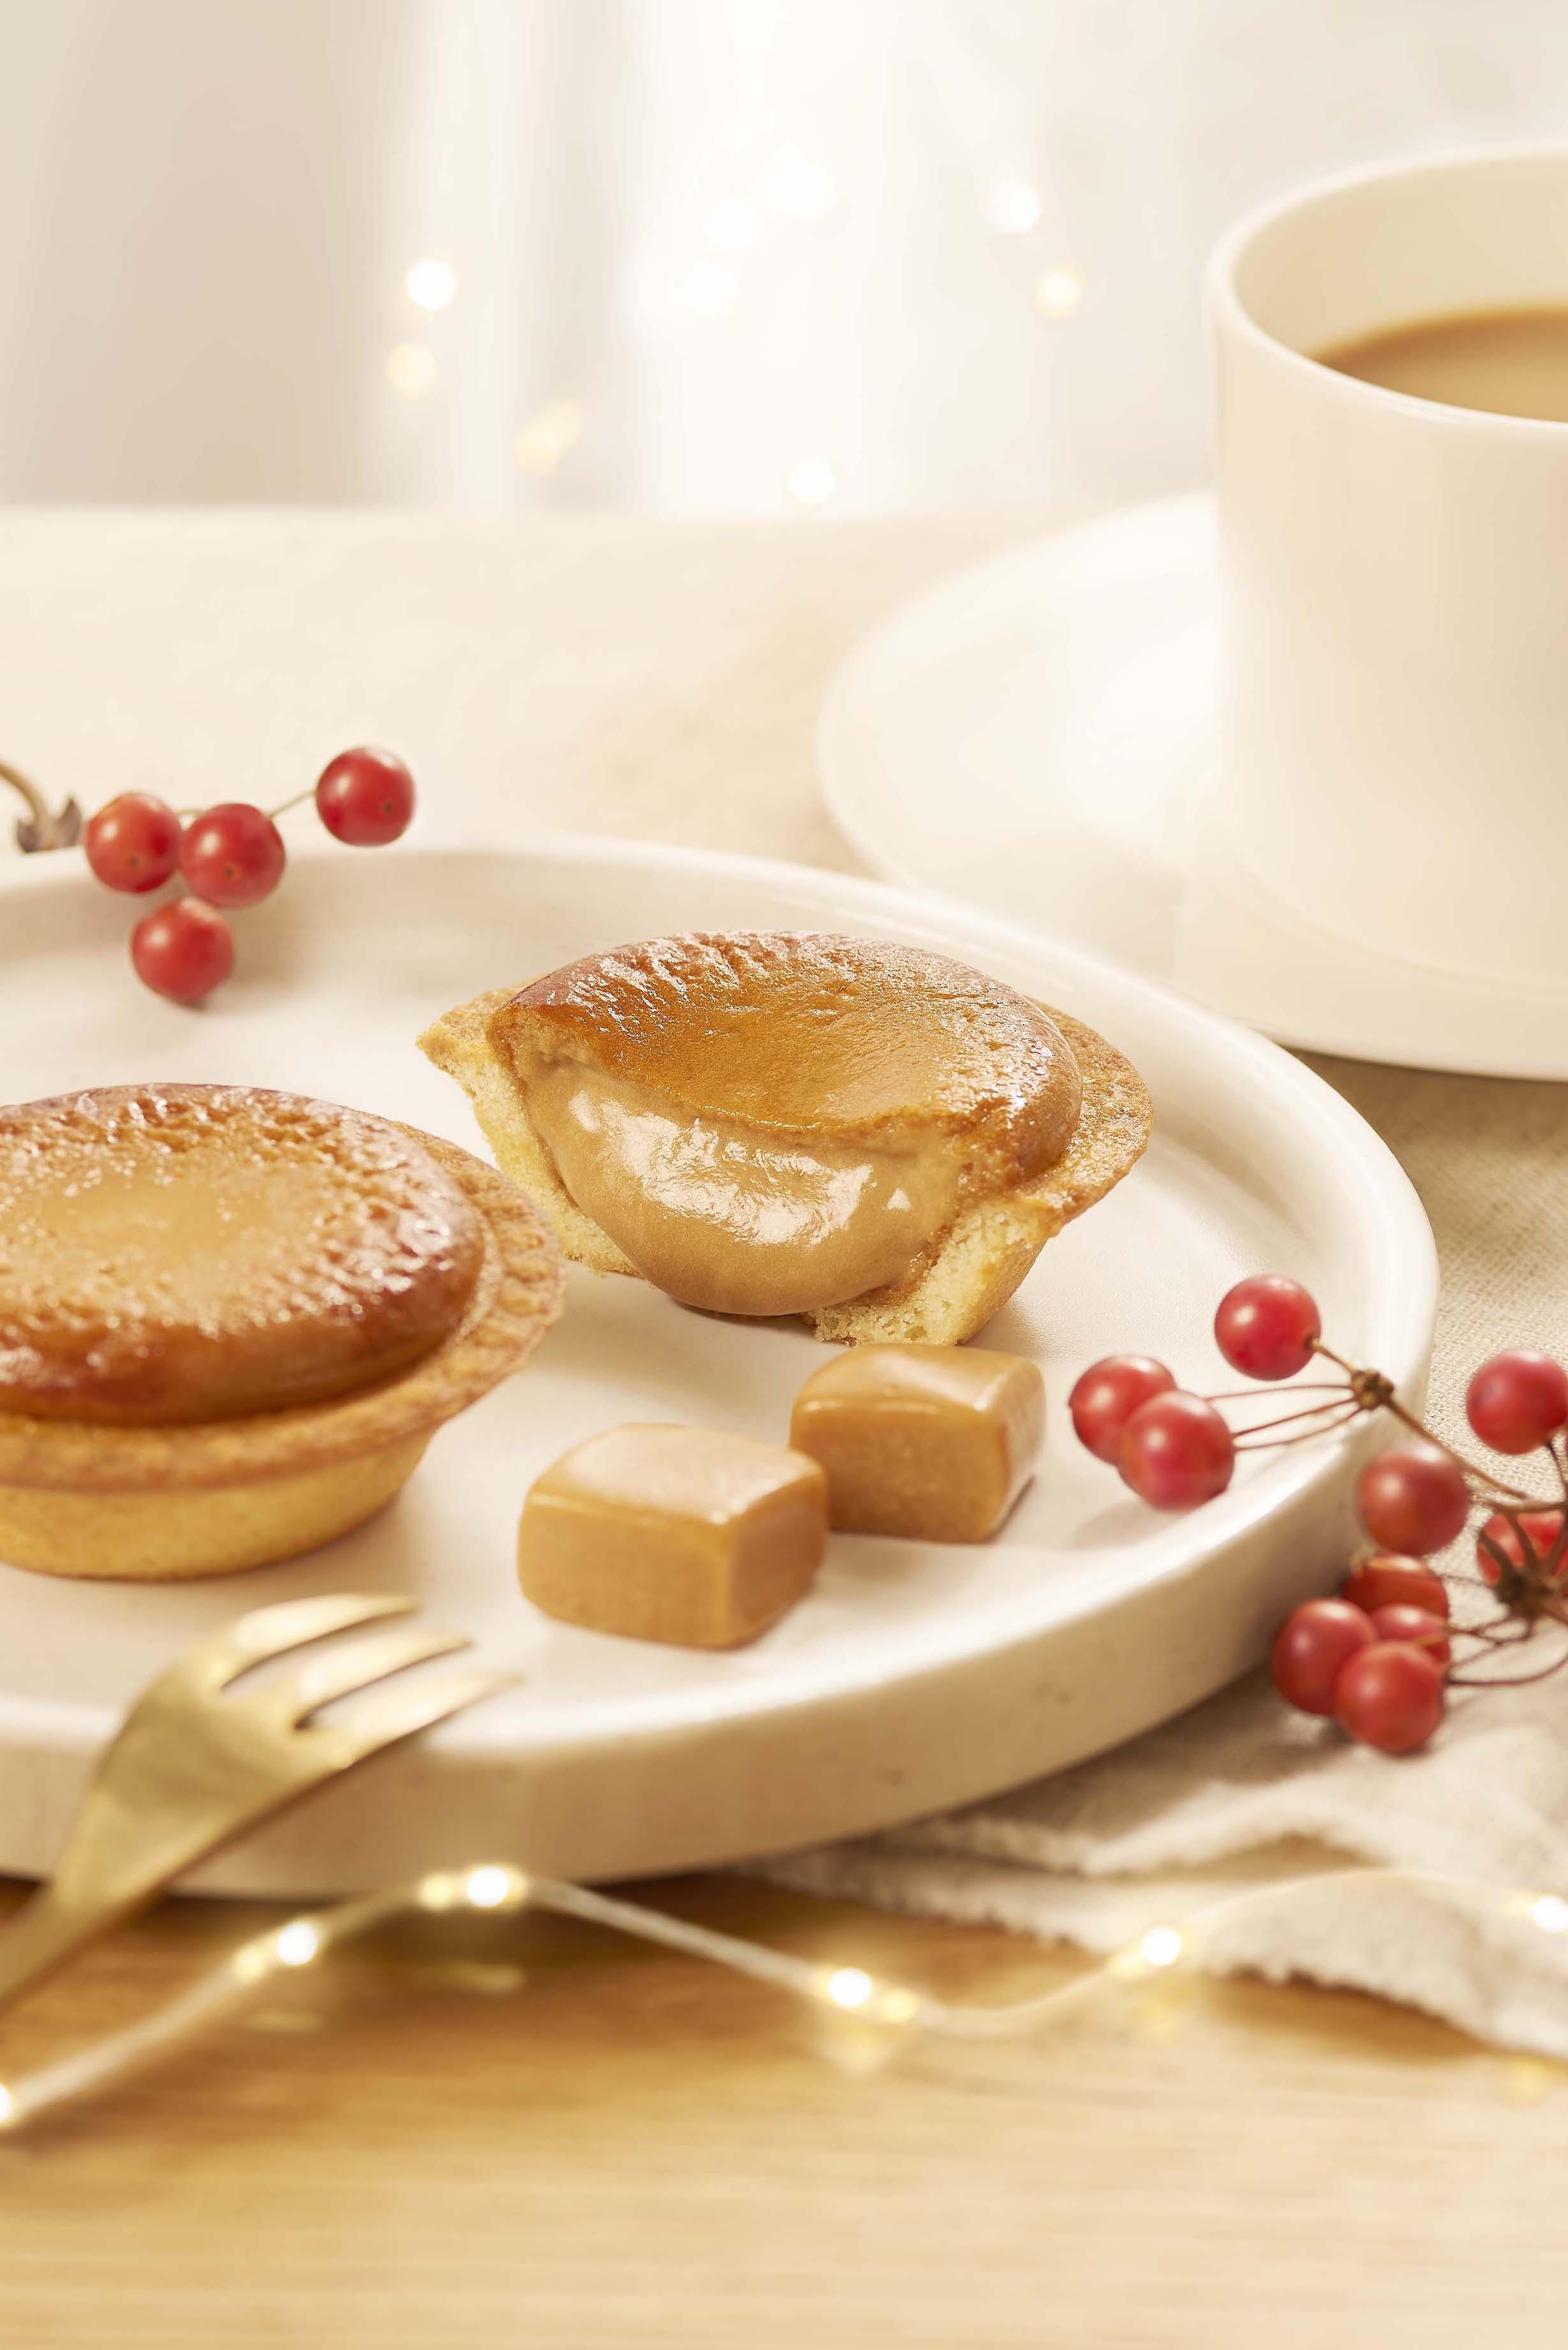 freshly-baked-caramel-cheese-tart-%e7%84%bc%e3%81%8d%e3%81%9f%e3%81%a6%e3%82%ad%e3%83%a3%e3%83%a9%e3%83%a1%e3%83%ab%e3%83%81%e3%83%bc%e3%82%ba%e3%82%bf%e3%83%ab%e3%83%883